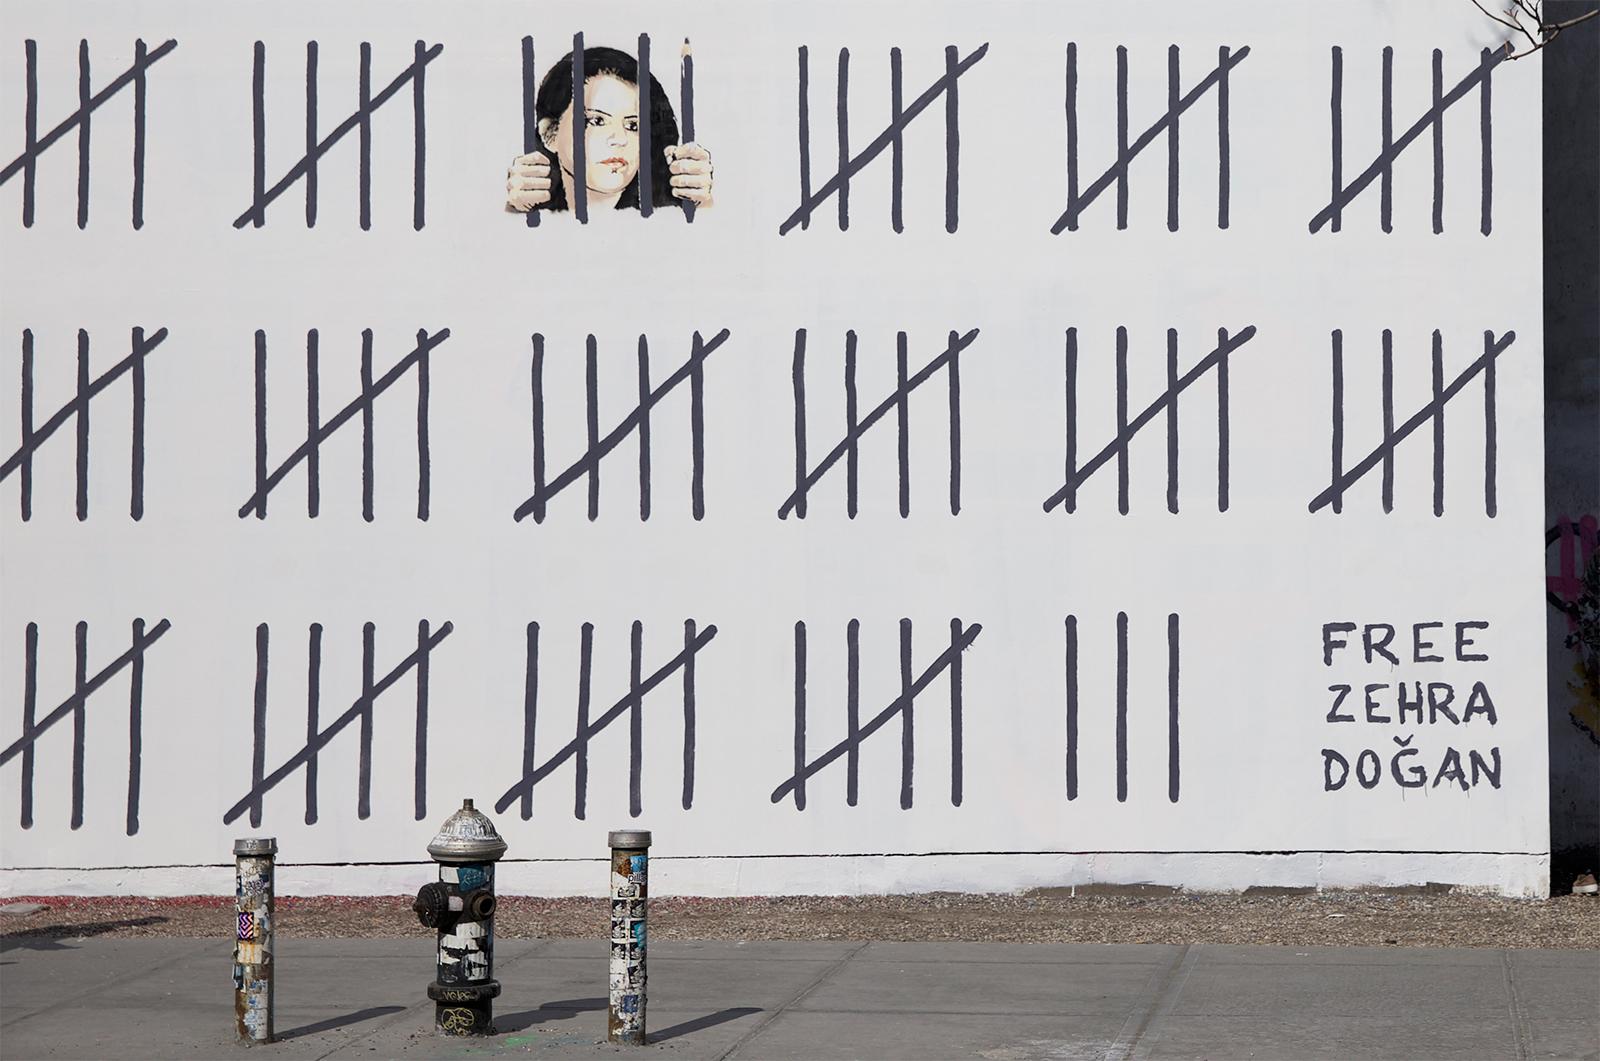 banksy - street art - graffiti - zehra dogan - new-york